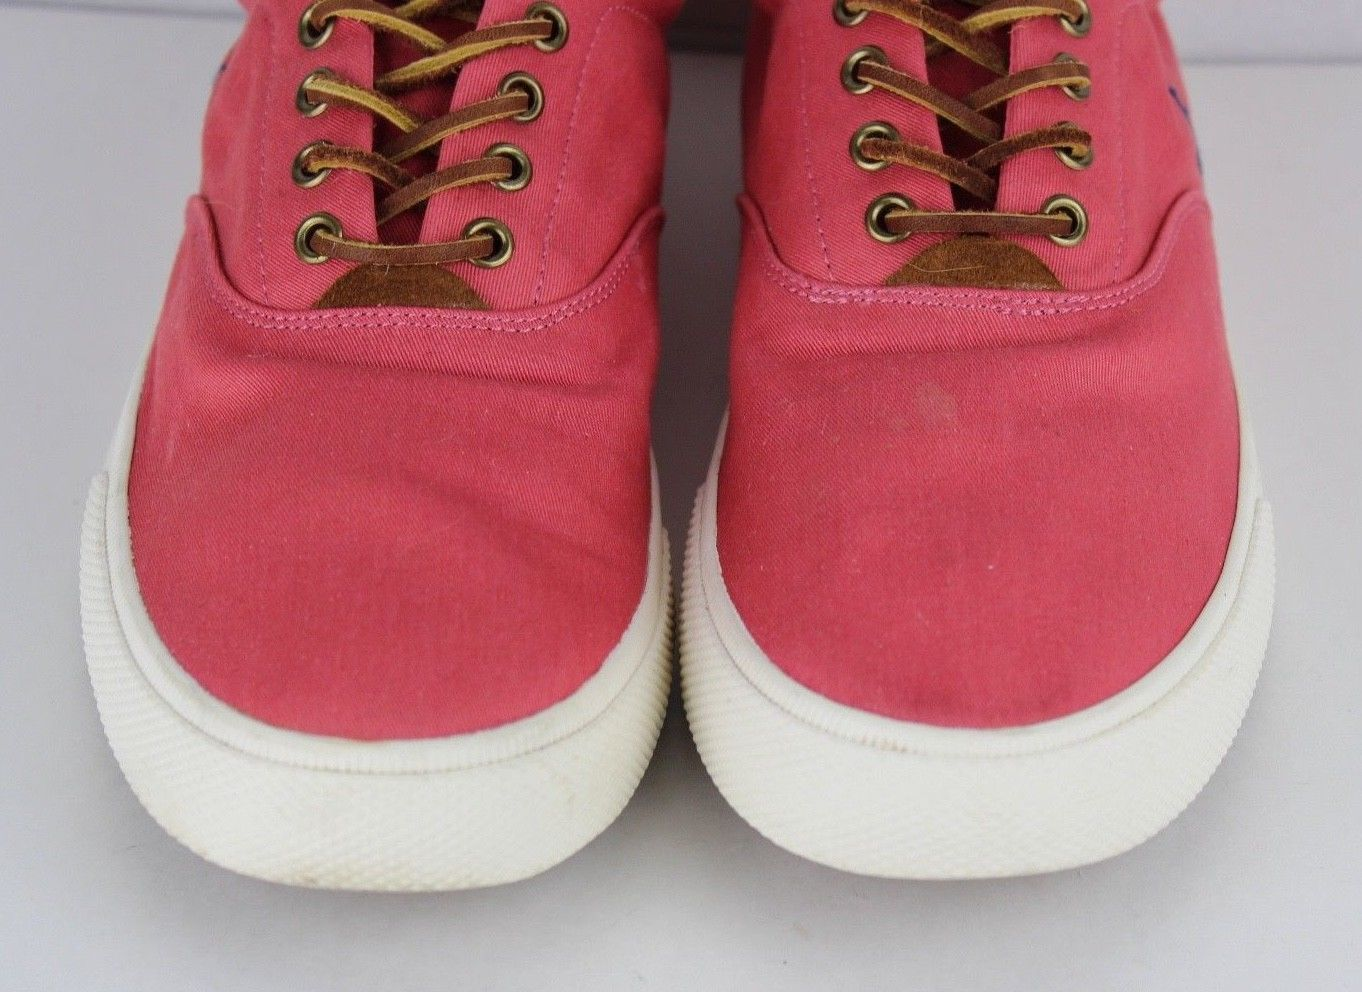 Polo Ralph Lauren Vaughn chambray herringbone suede sneakers shoes size 13 D